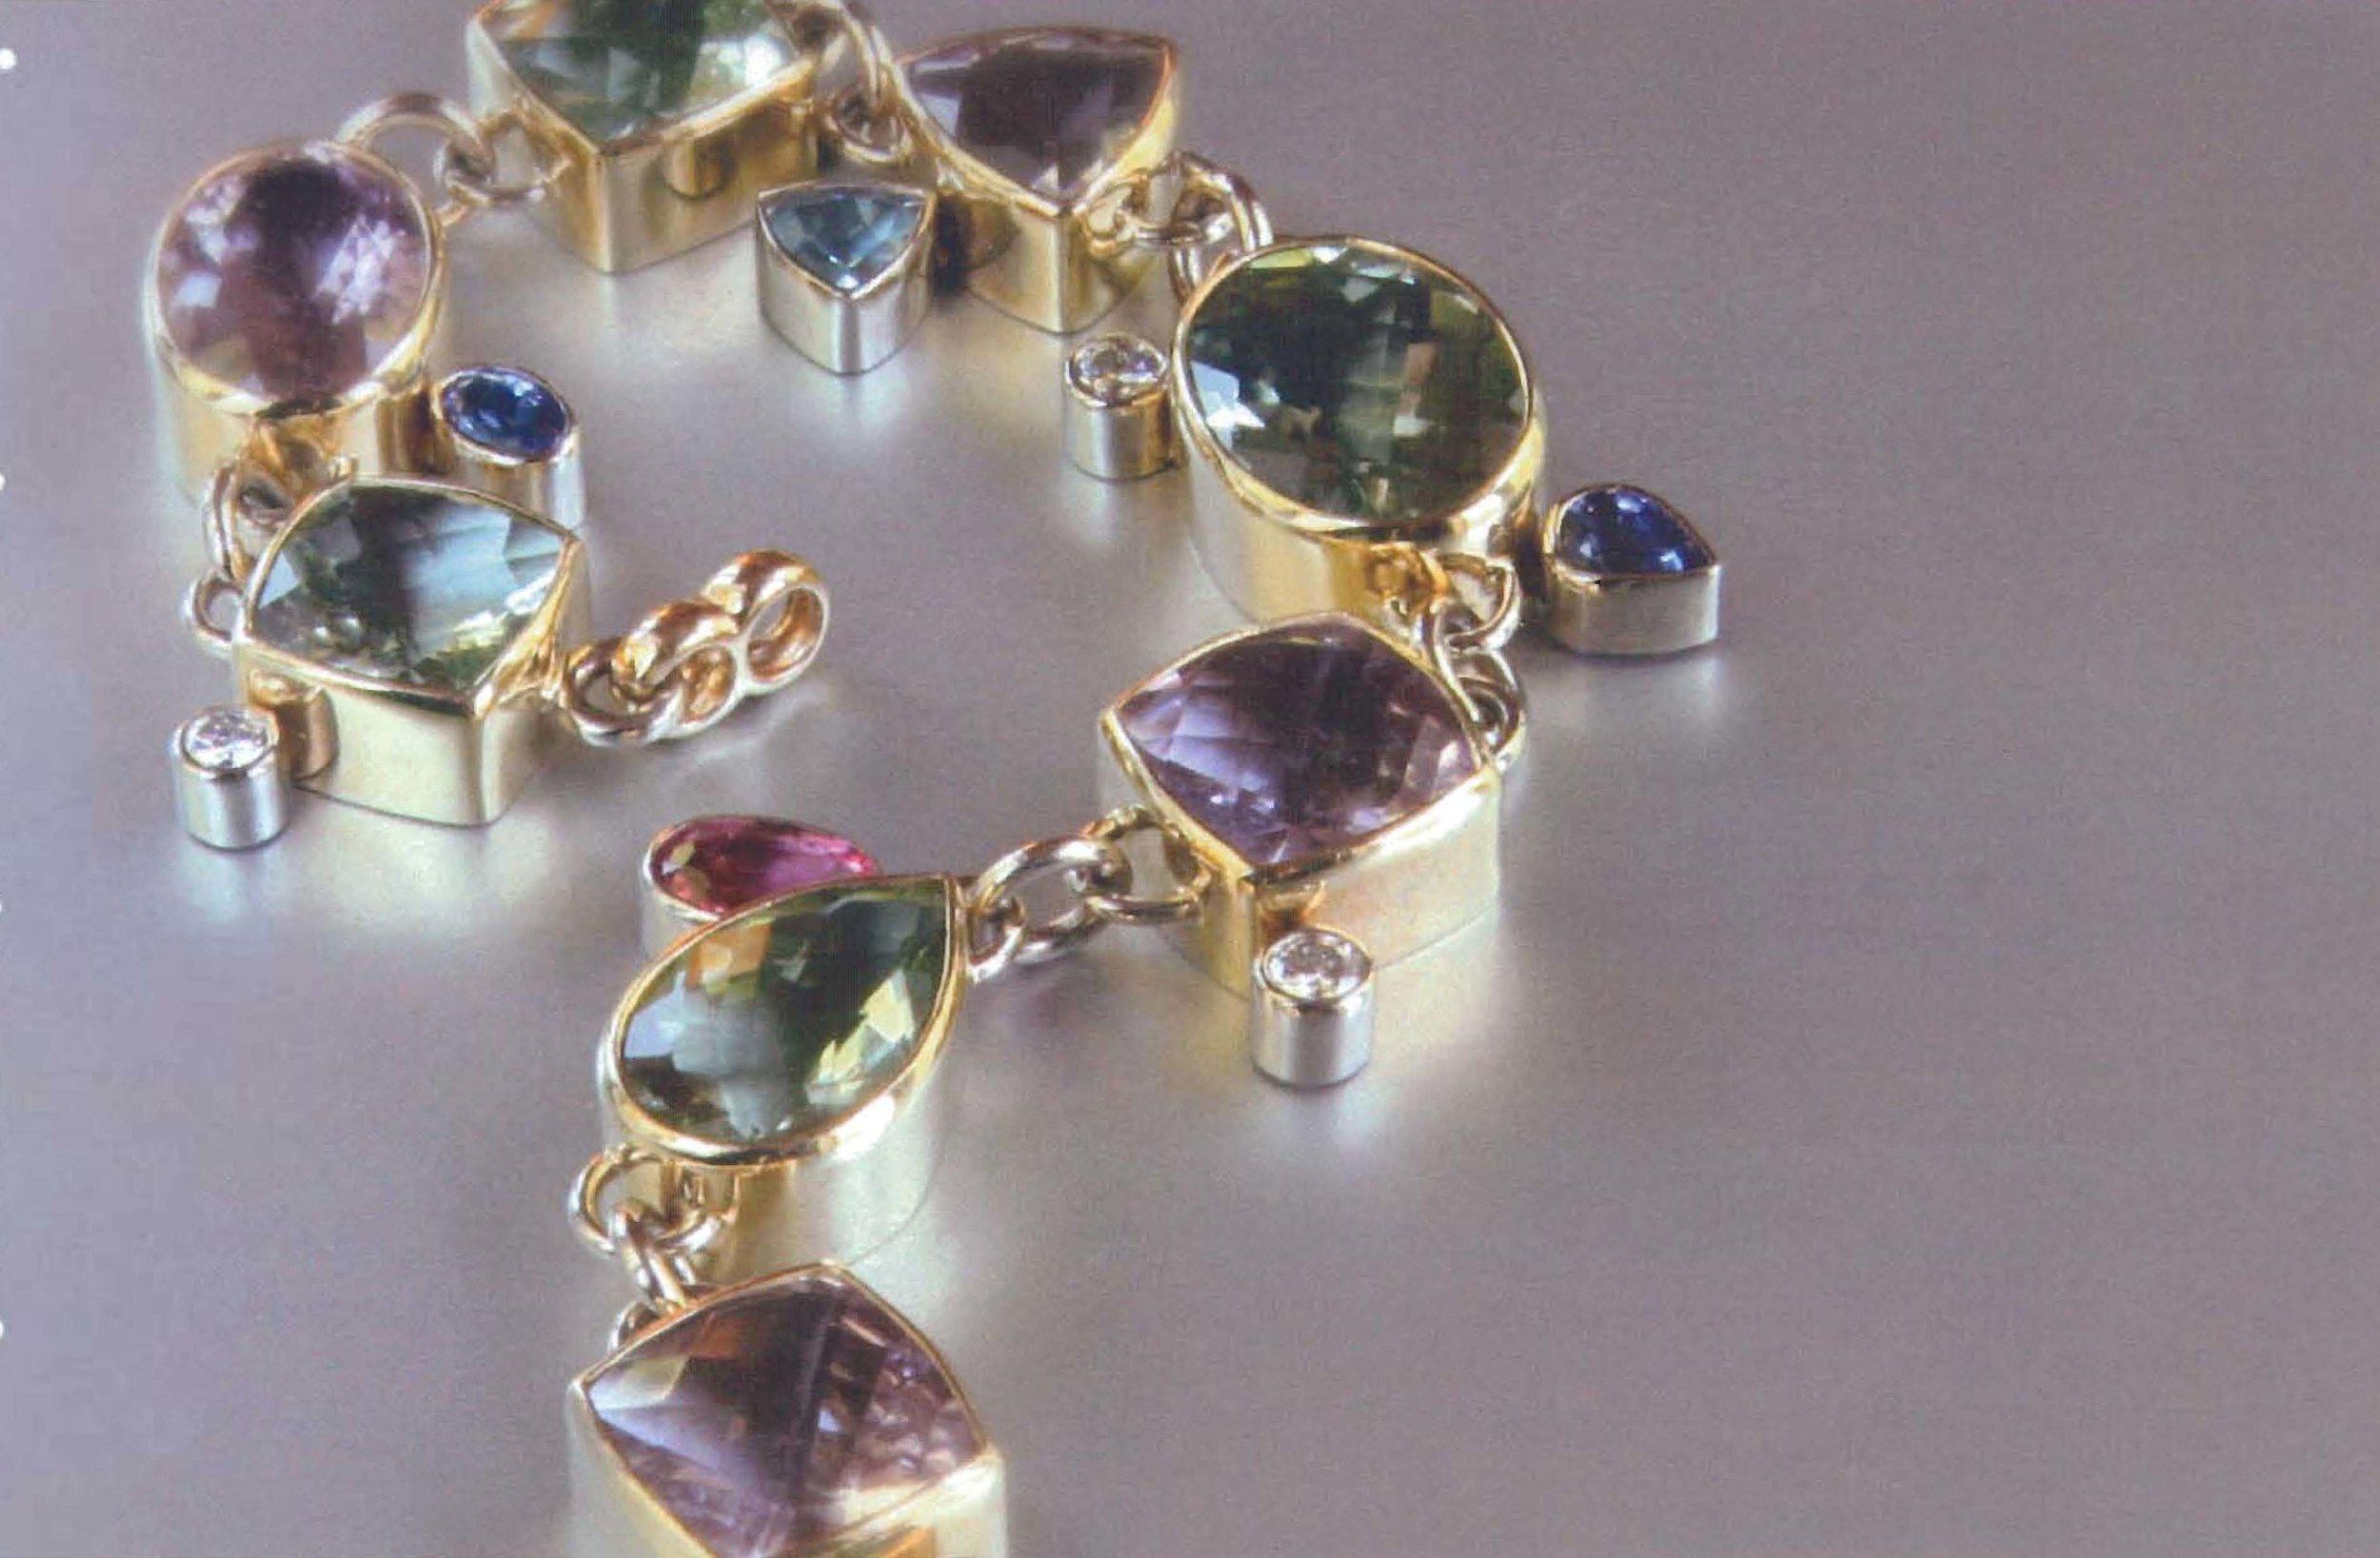 18kt Yellow Gold Bracelet with Bezel Set Precious Stones